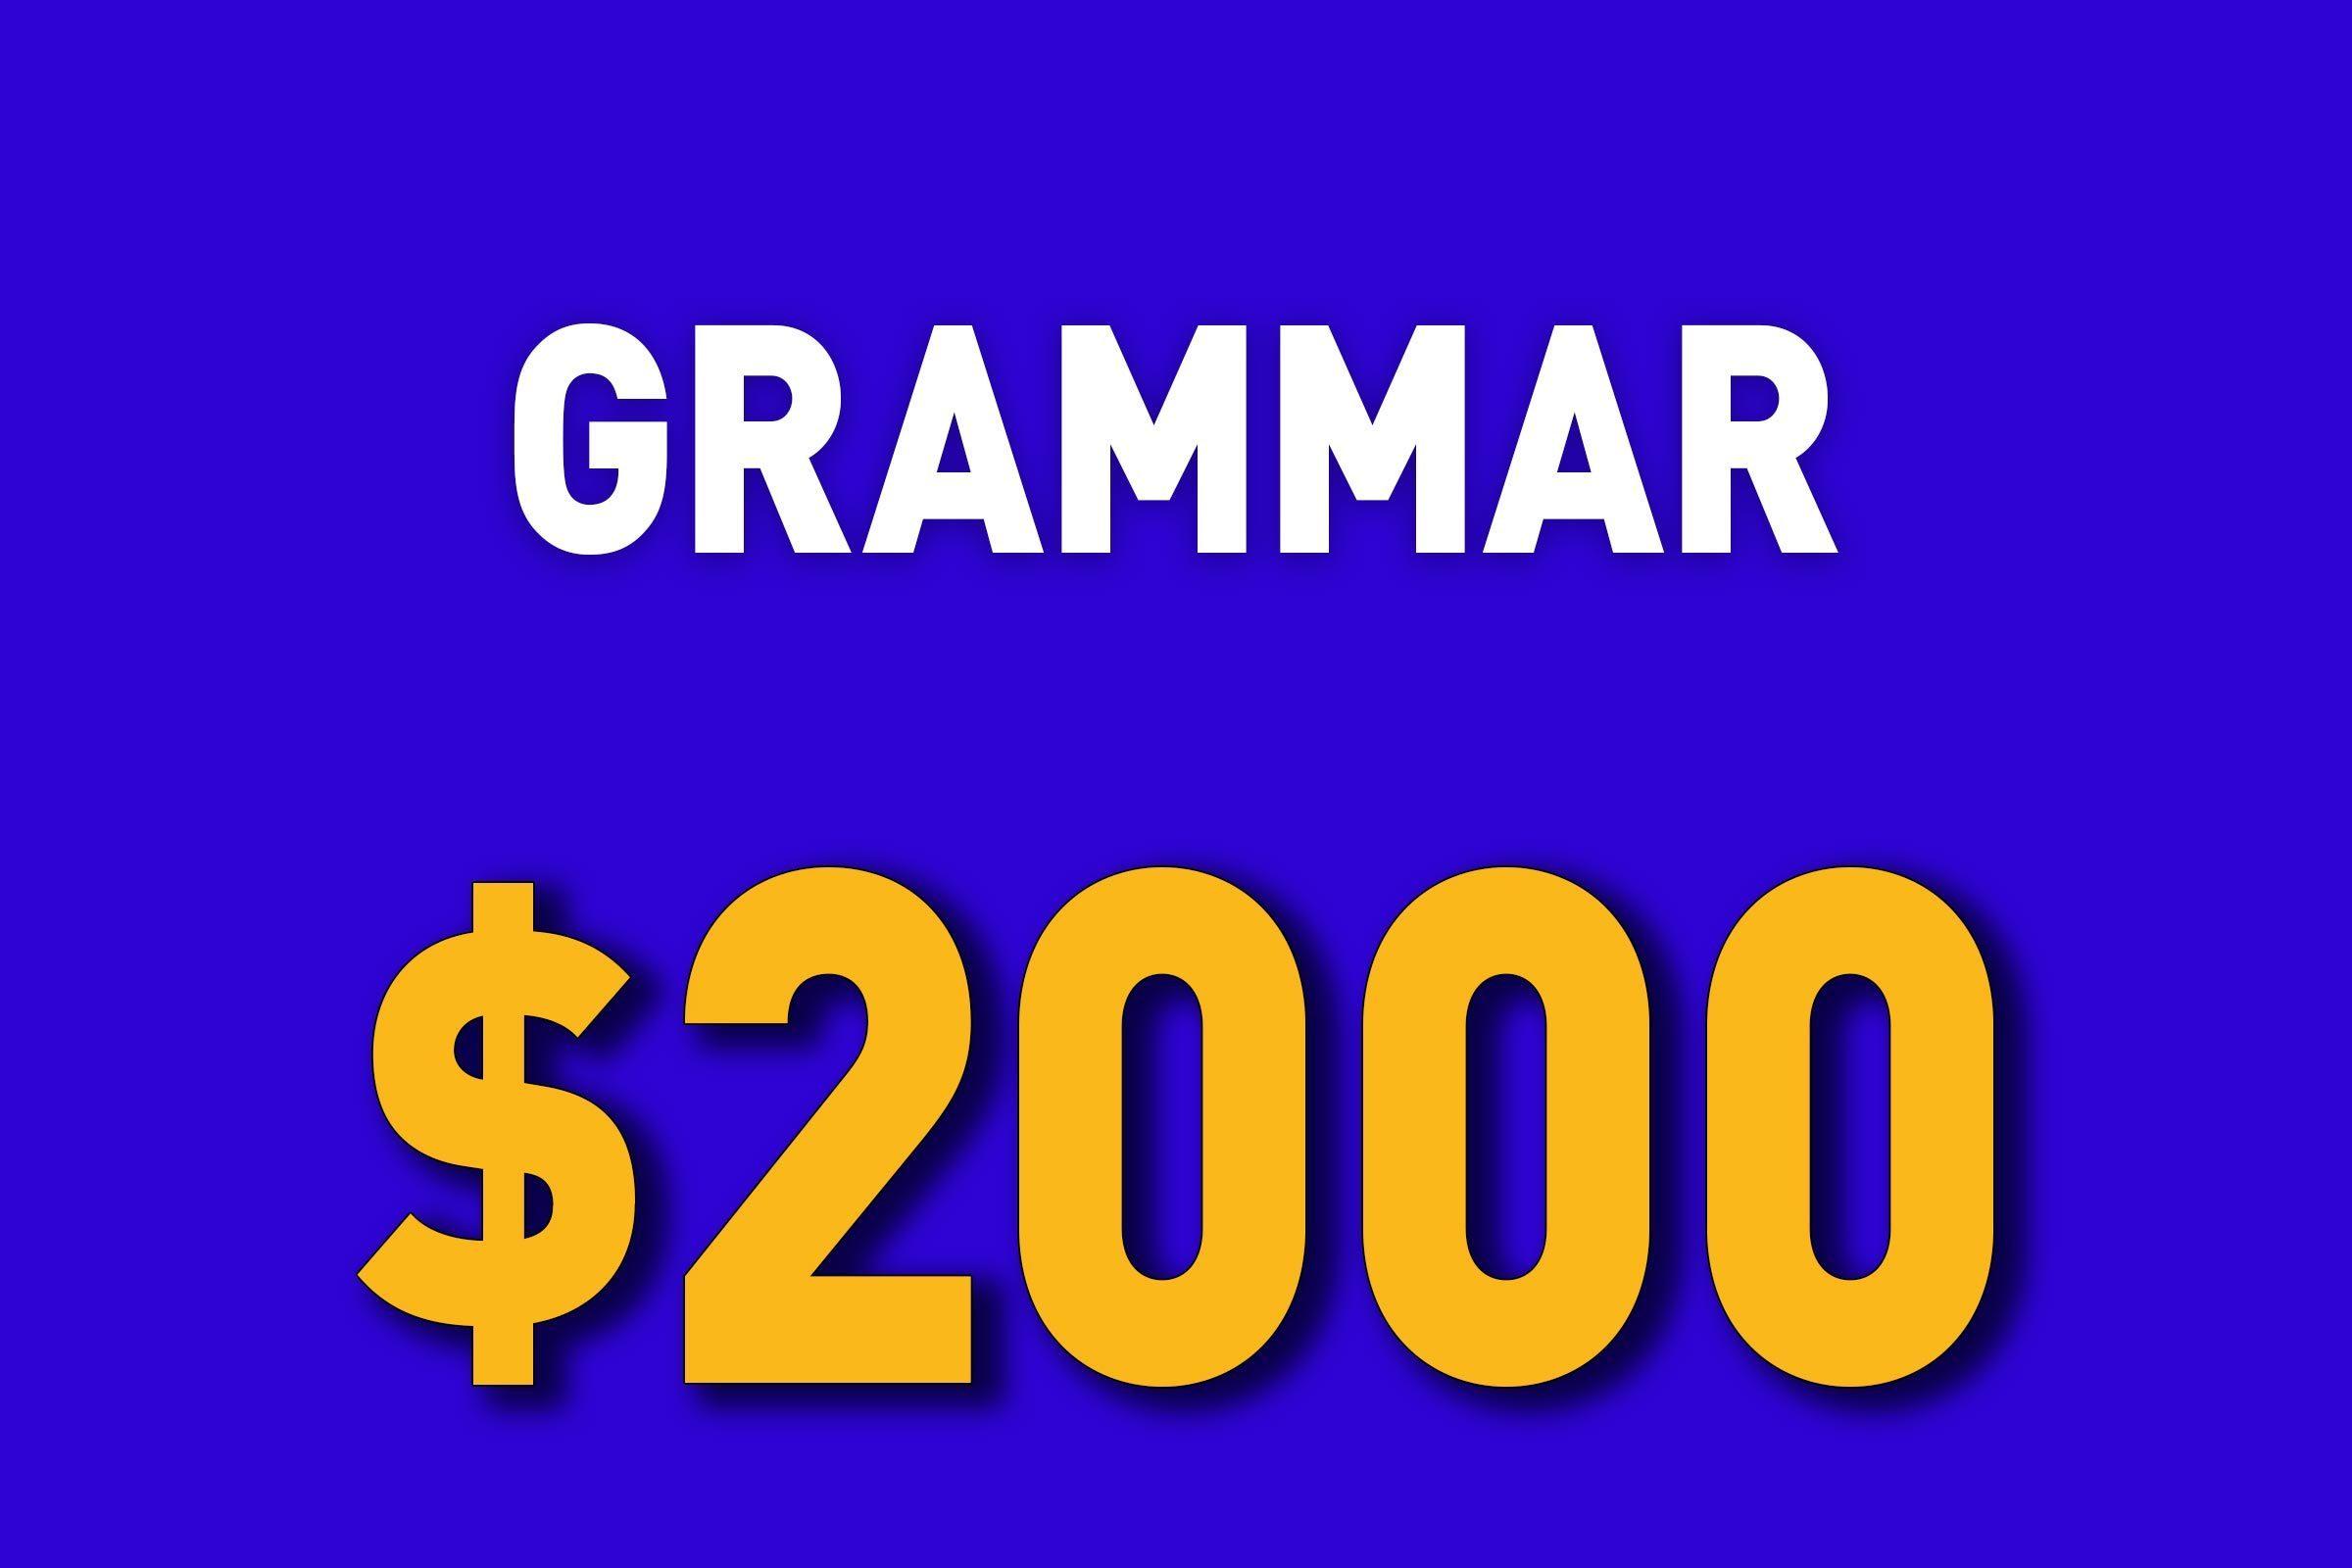 Grammar for $2000